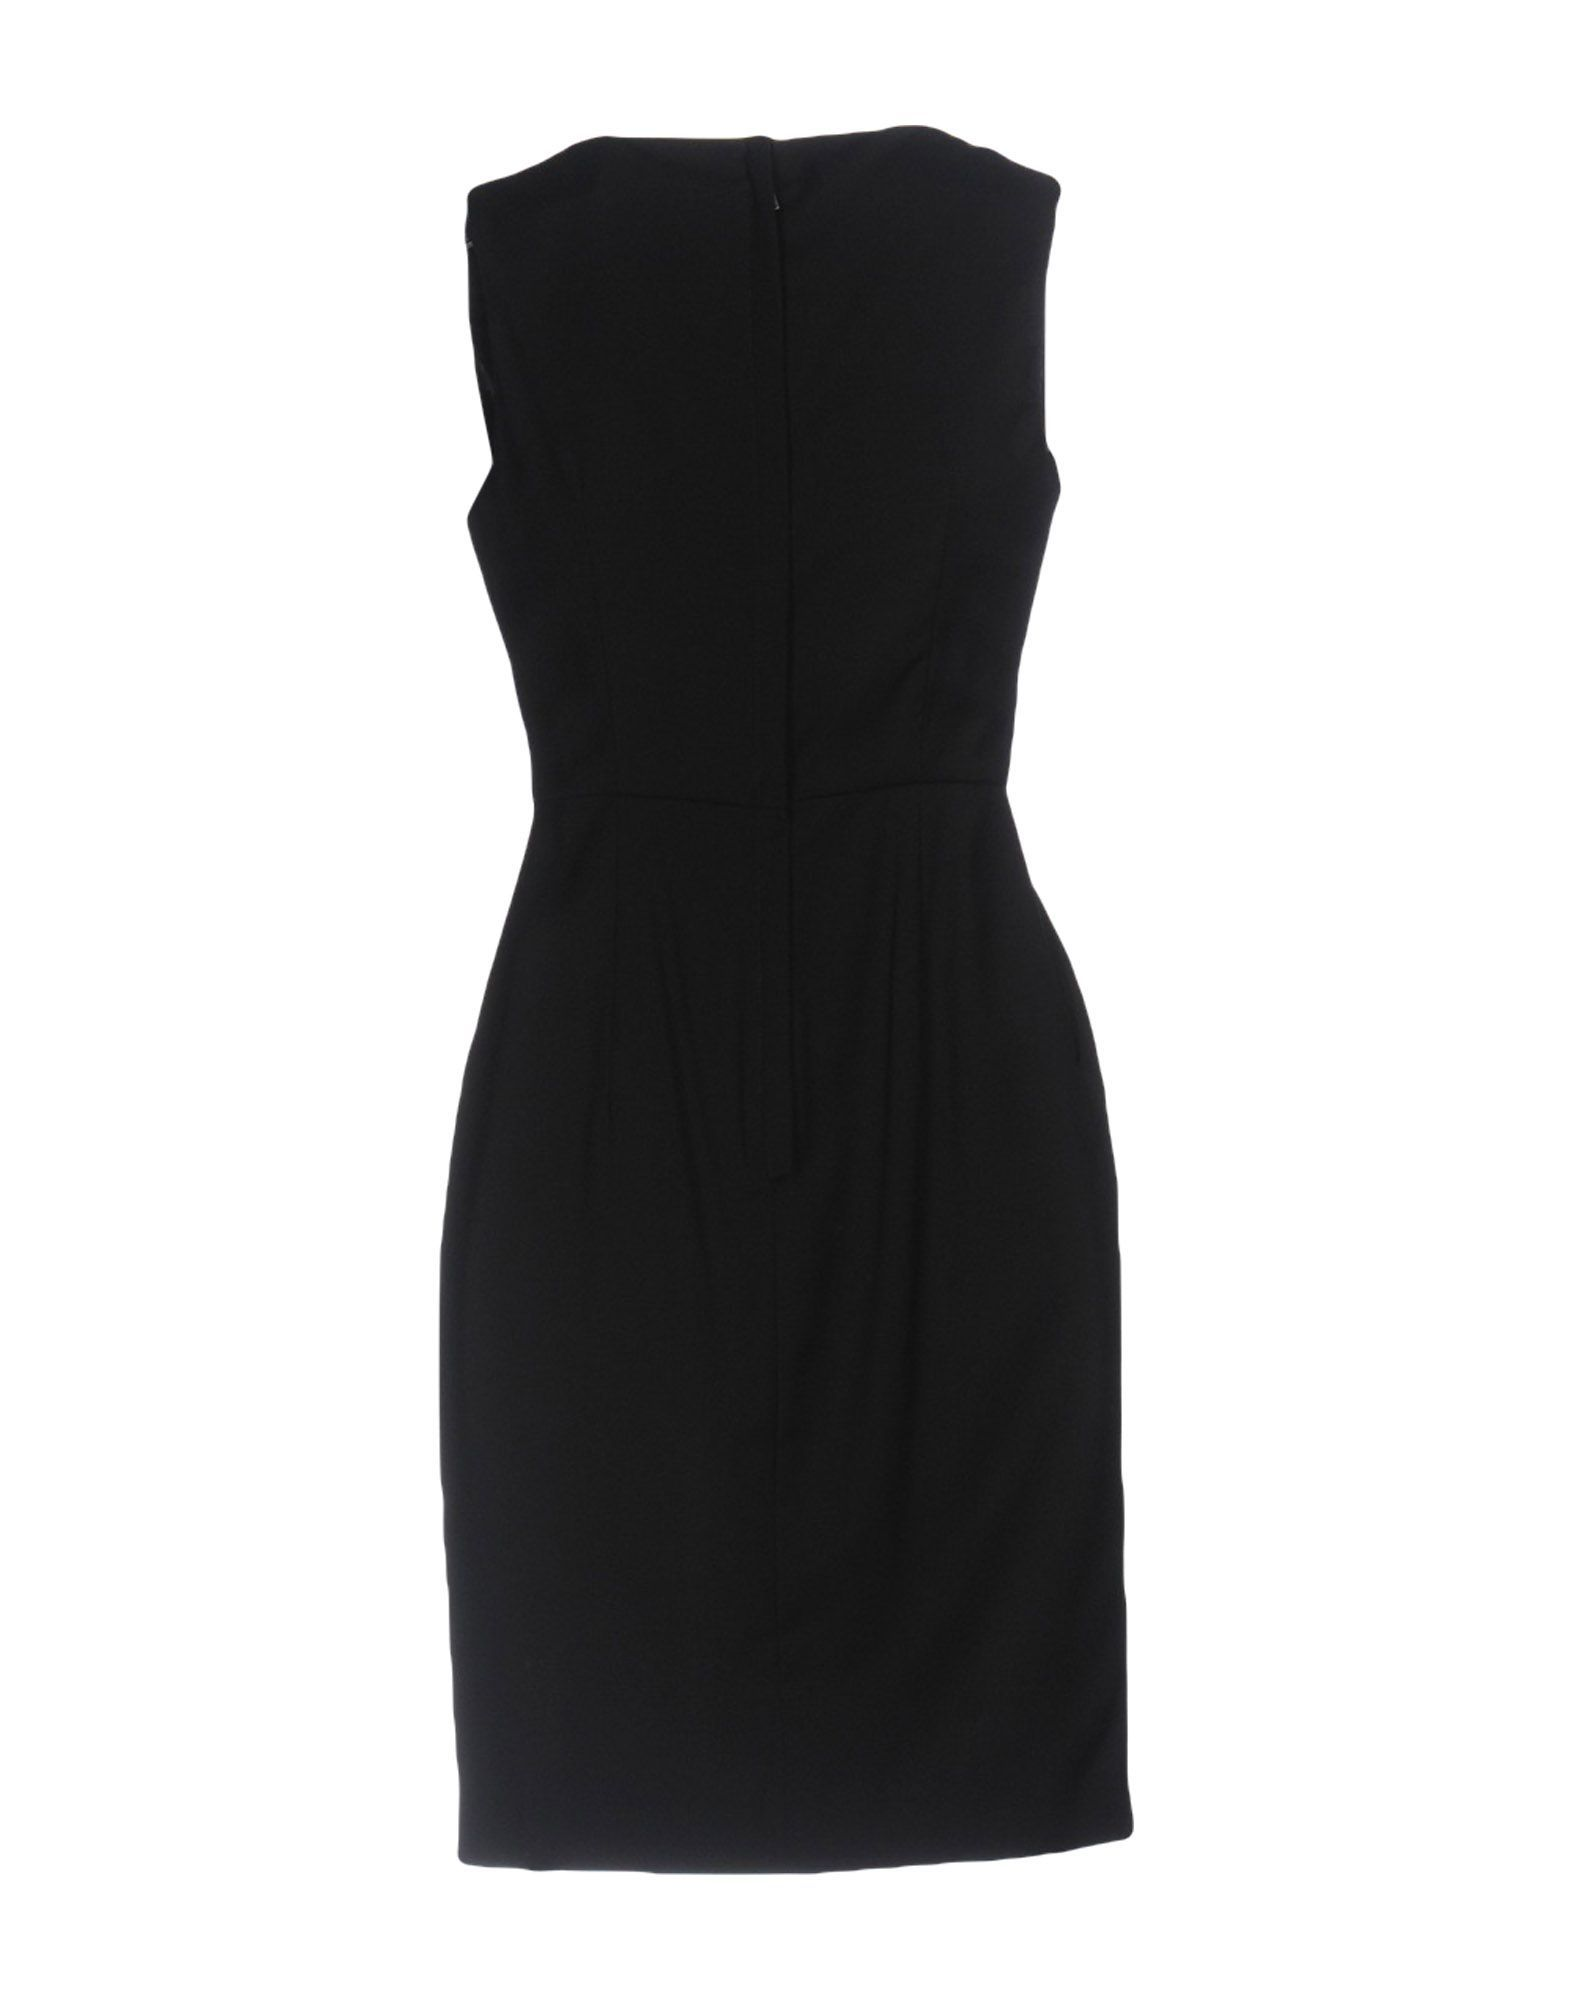 Richmond X Black Sleeveless Dress